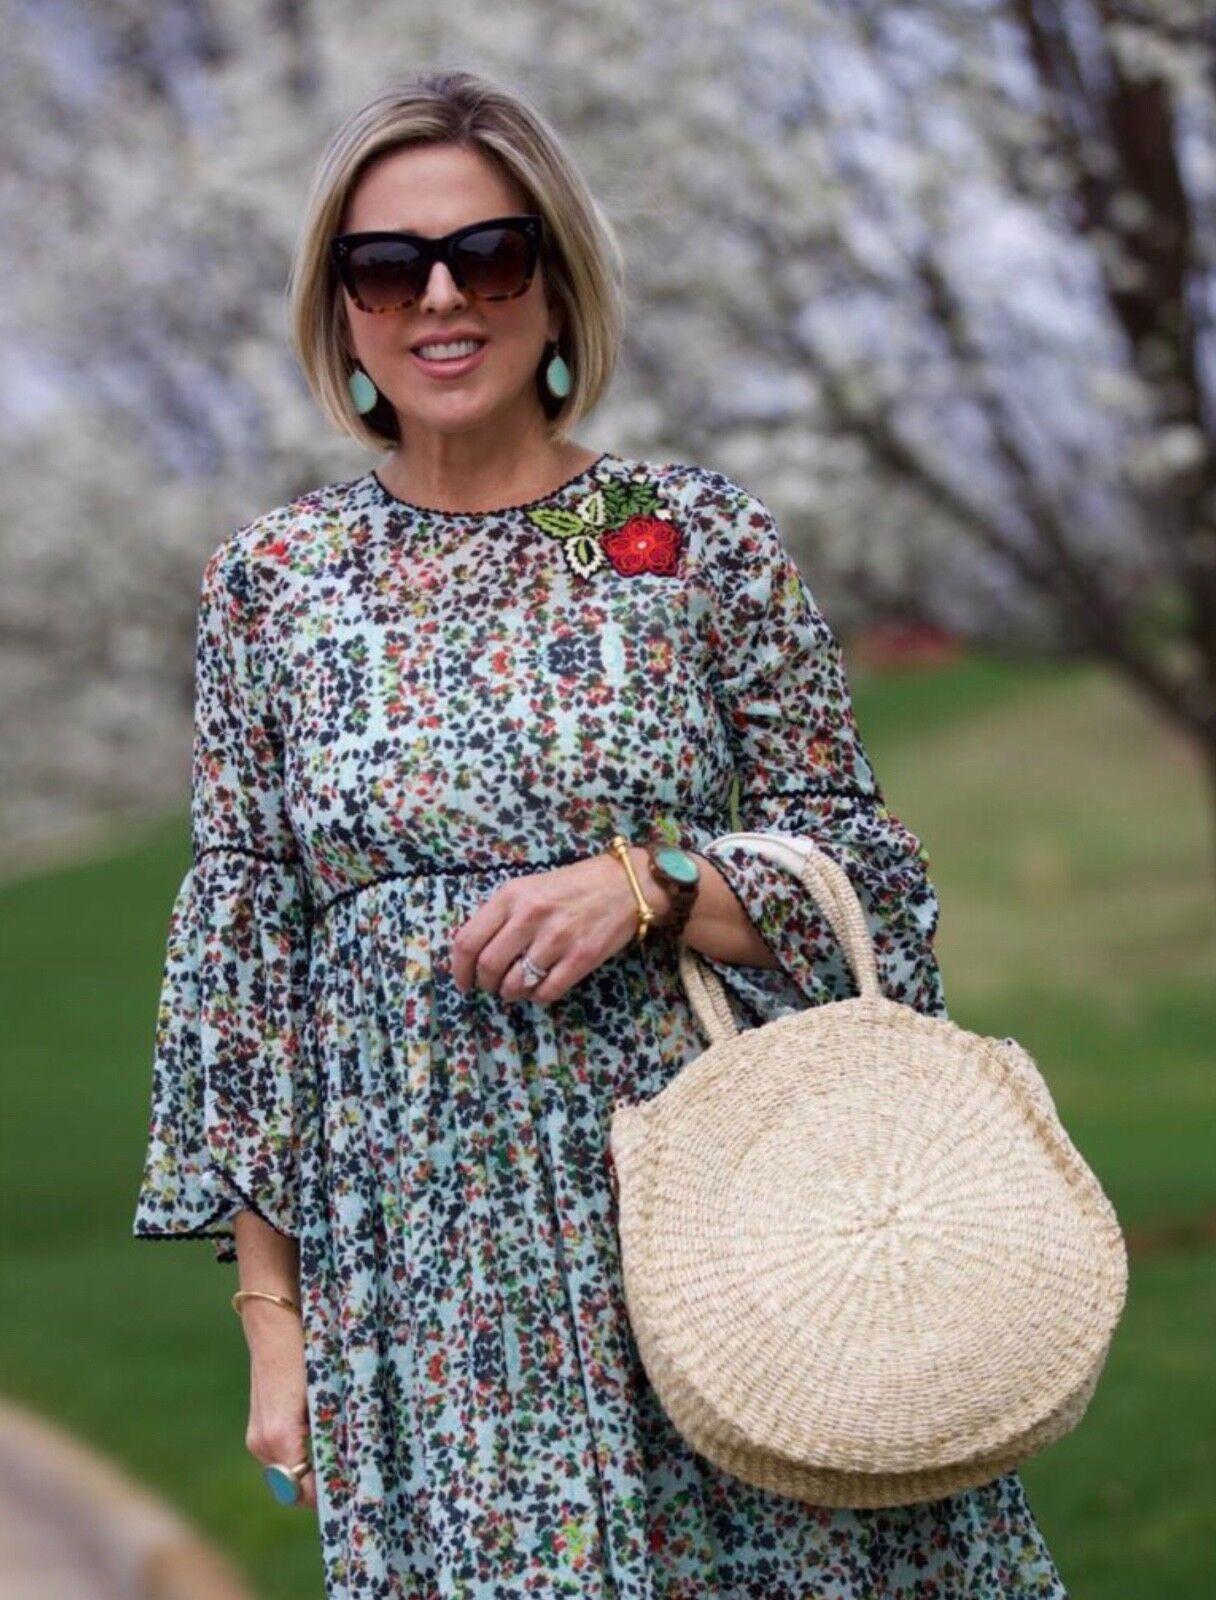 NEW Anthropologie Libra Embroiderot Tunic Dress Größe 0 Jyoti